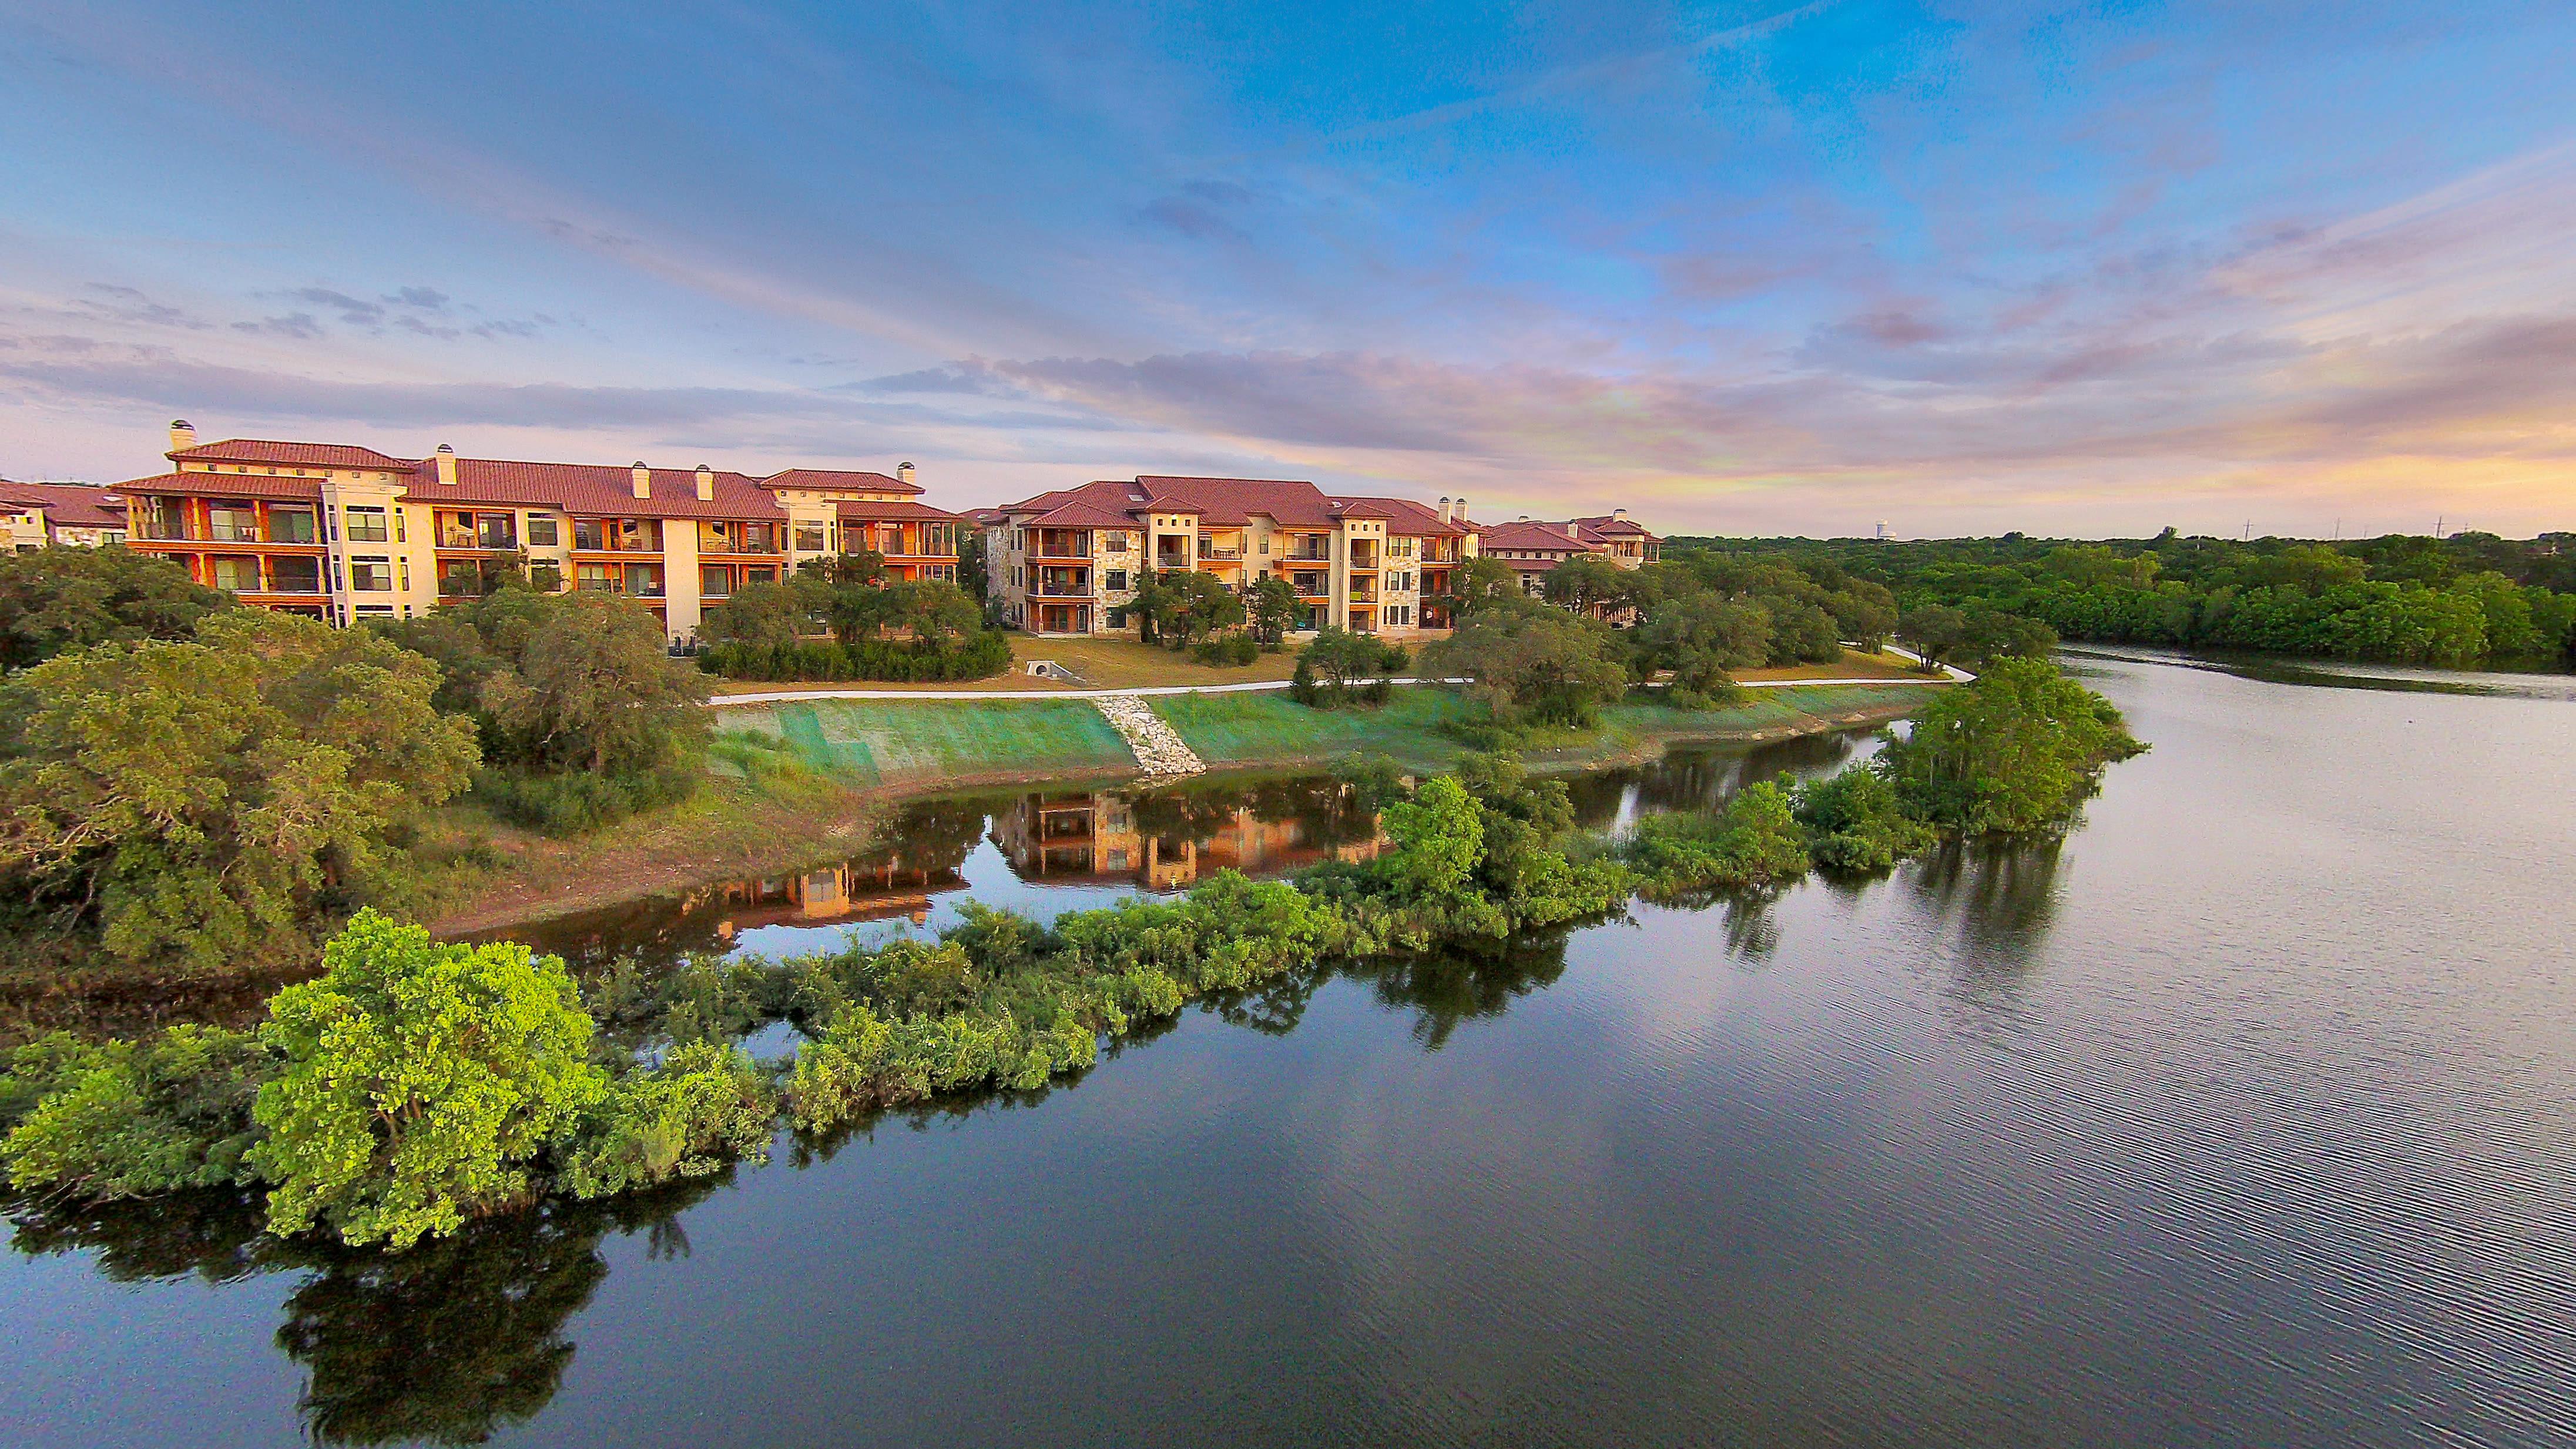 Muir Lake - Austin, TX